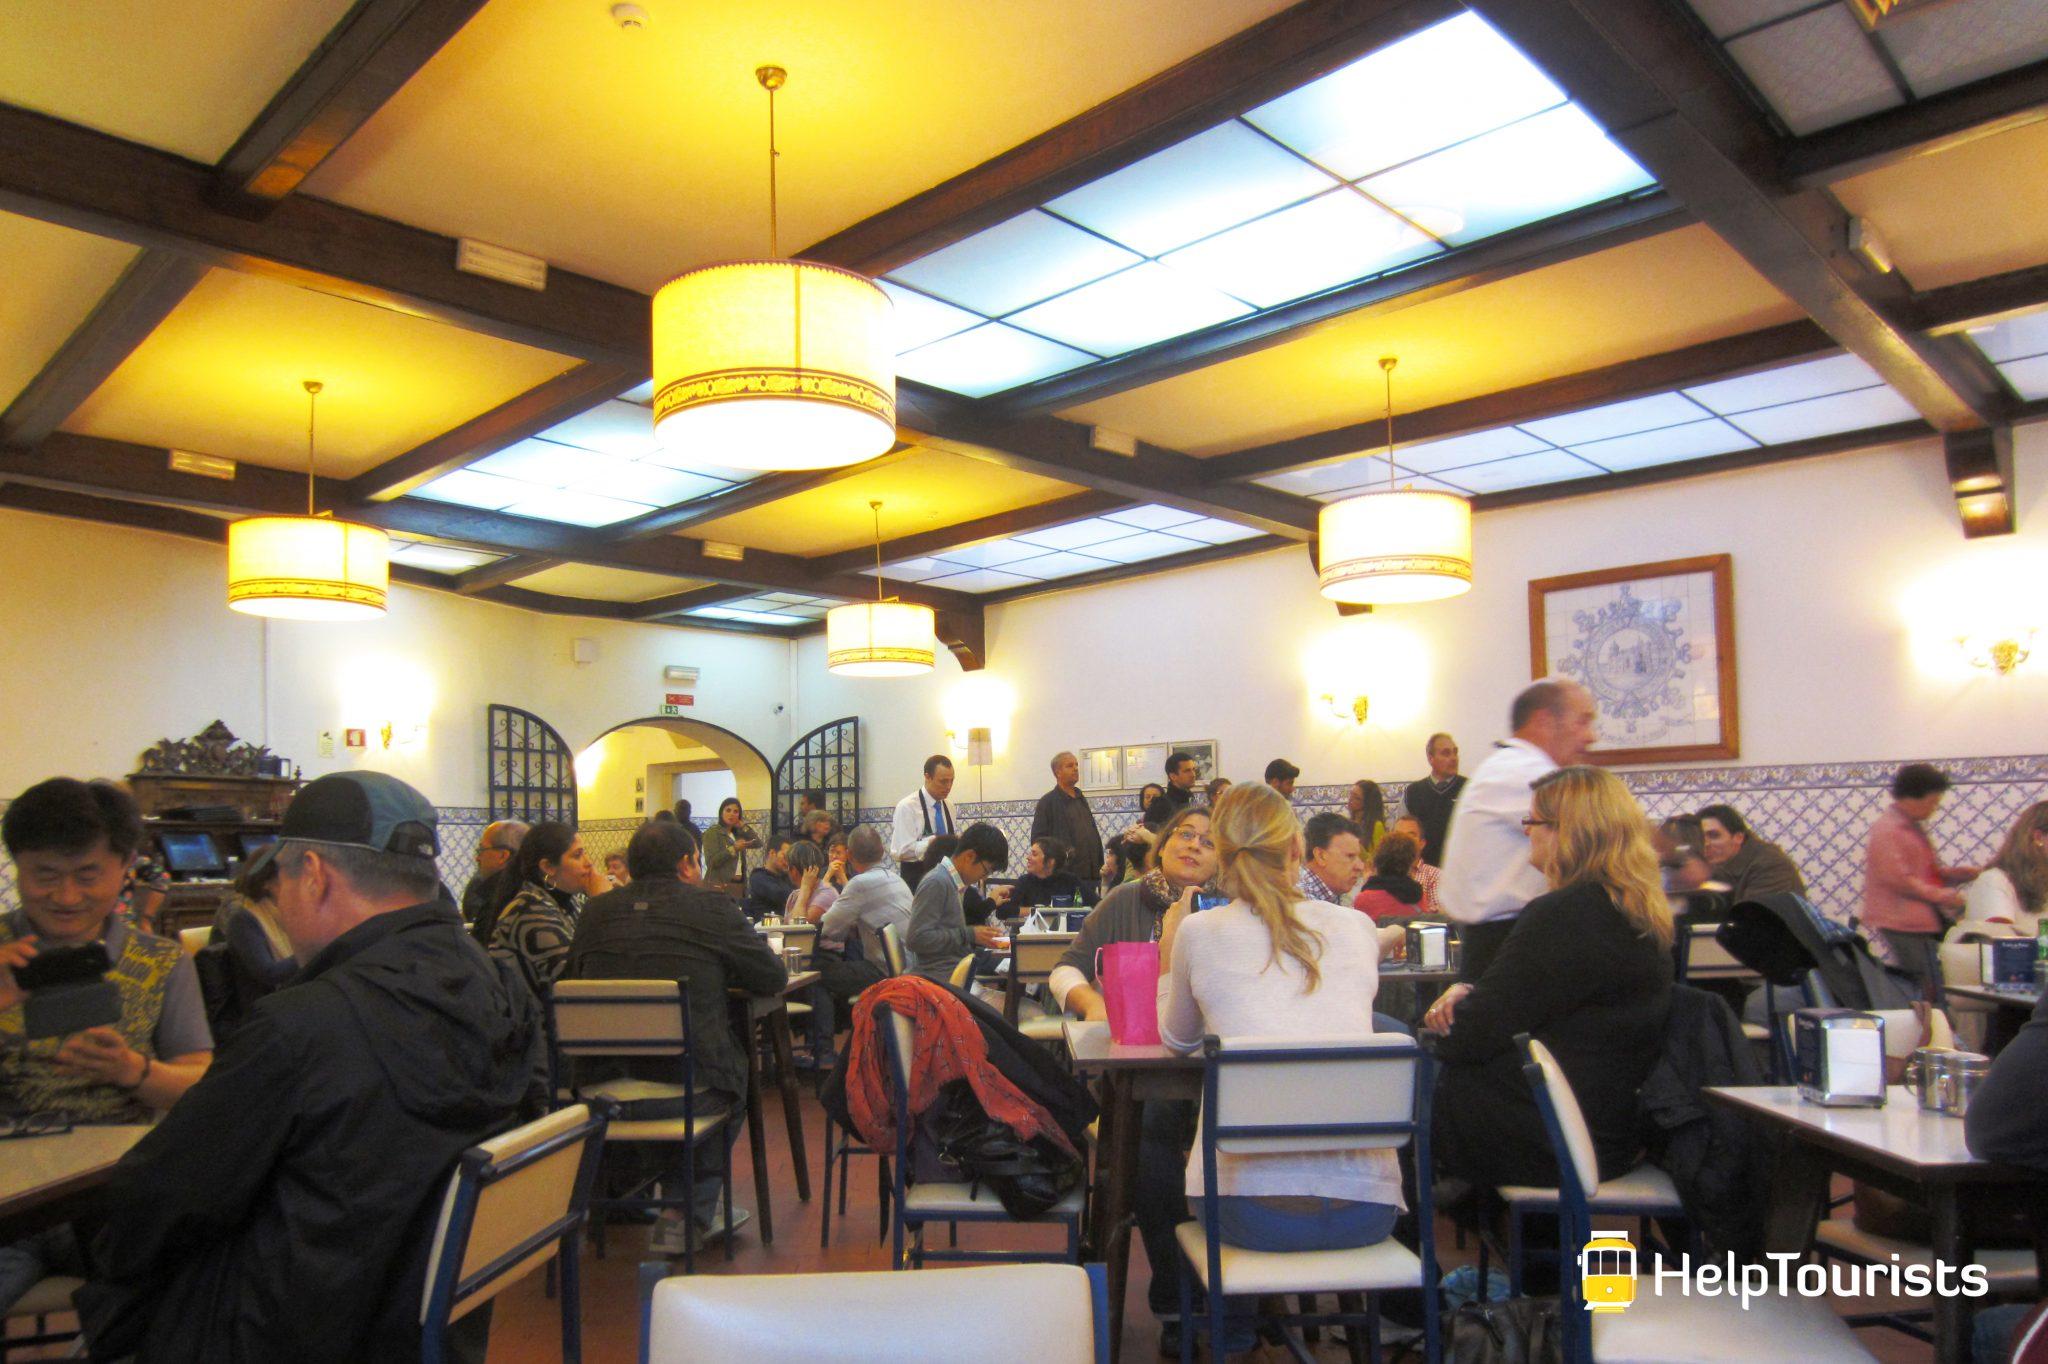 Lissabon_Pasteis-de-Belém_Cafe_Belém_02_l